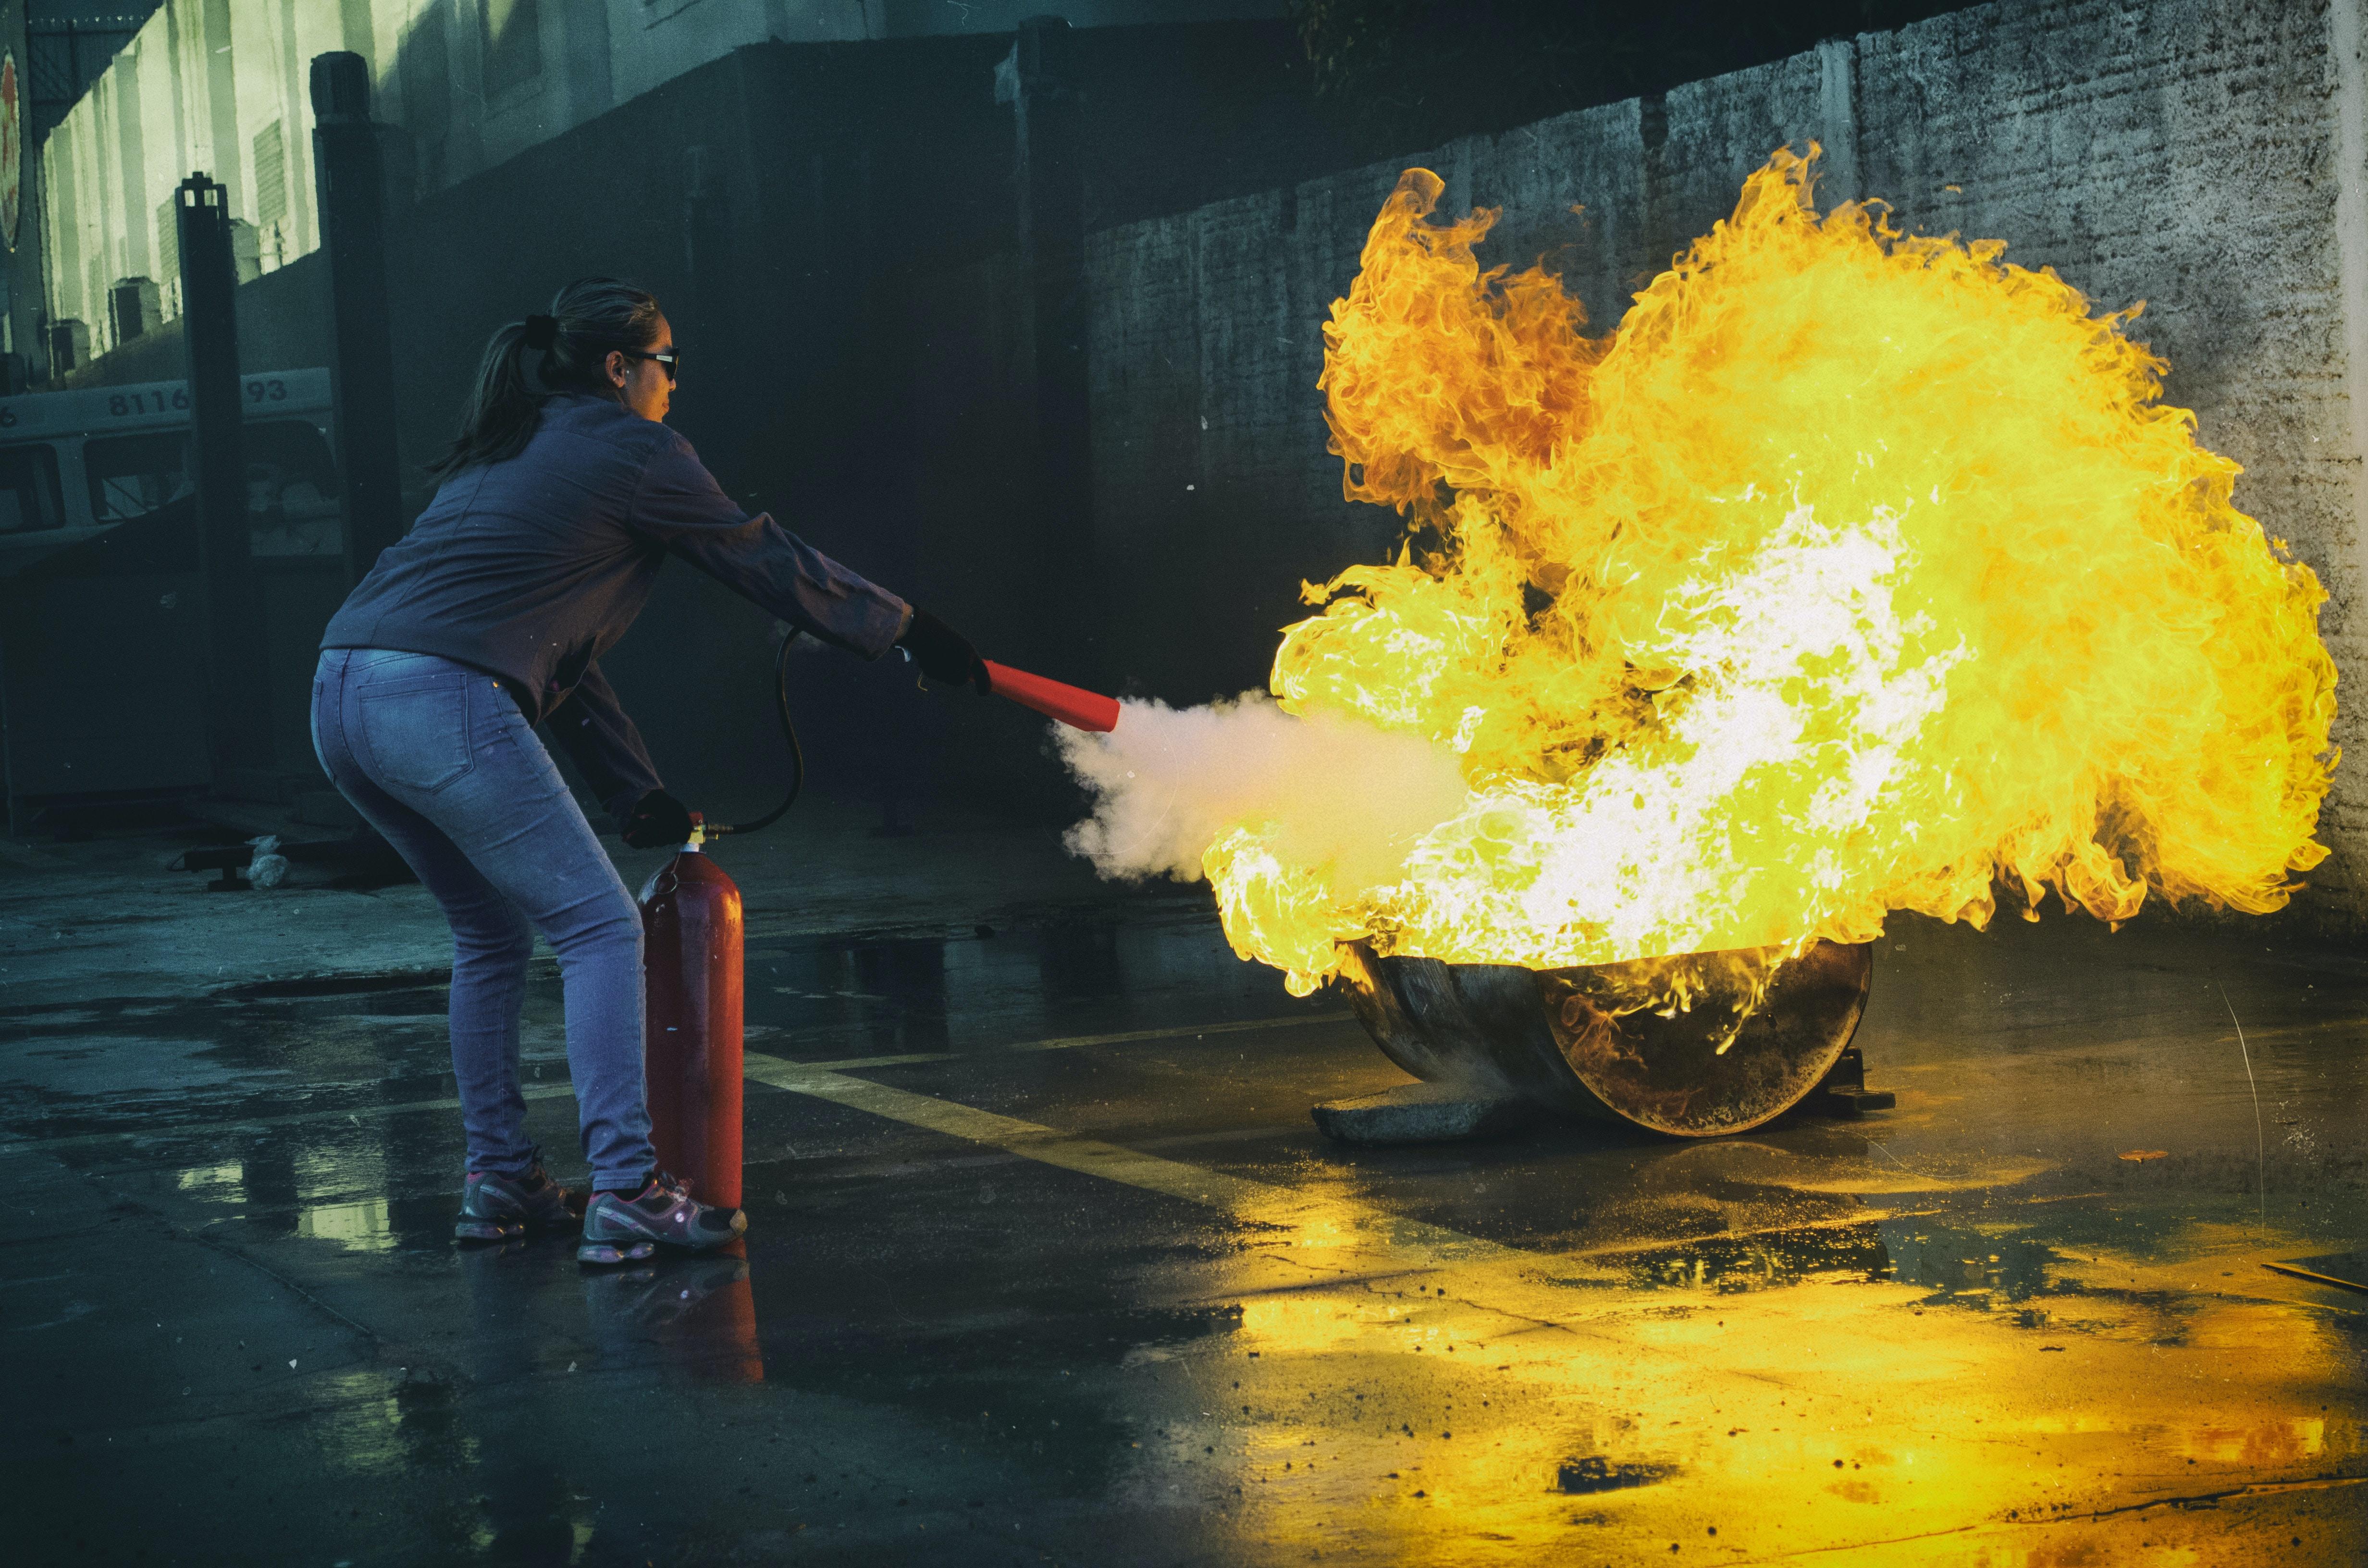 PNNL Fire Extinguisher Training AM